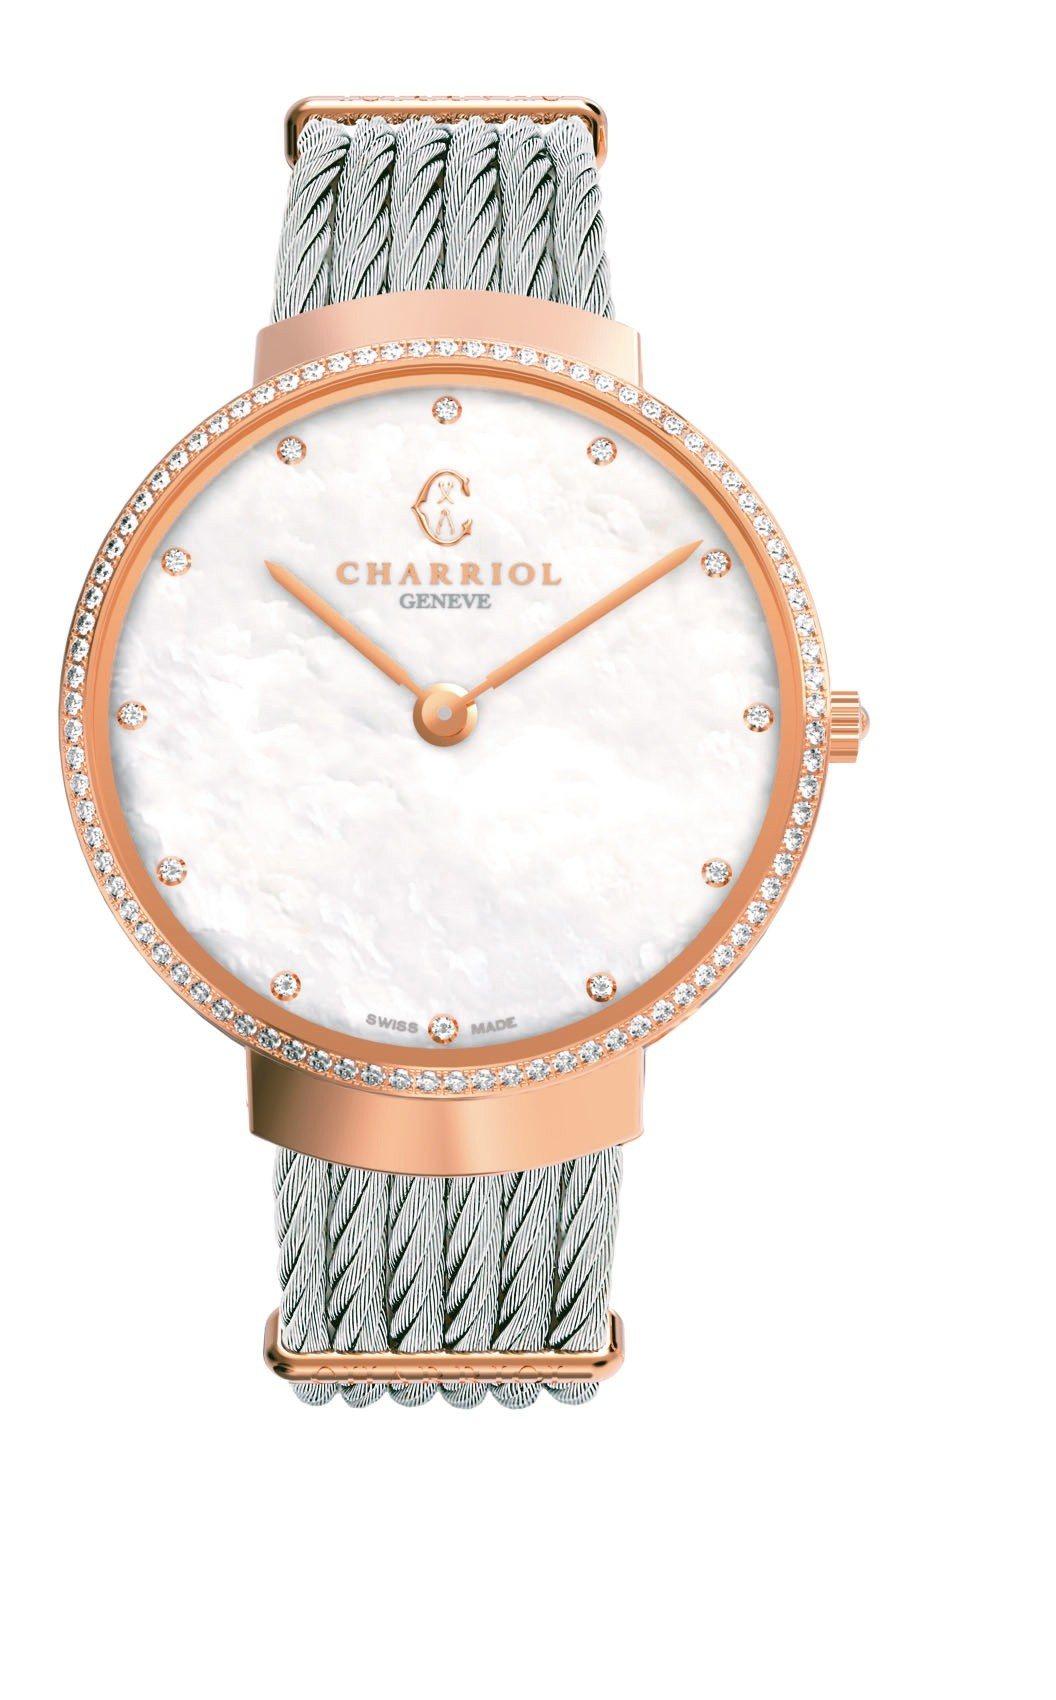 Slim系列34毫米腕表搭配珍珠母貝表盤,99,300元。 圖/夏利豪提供